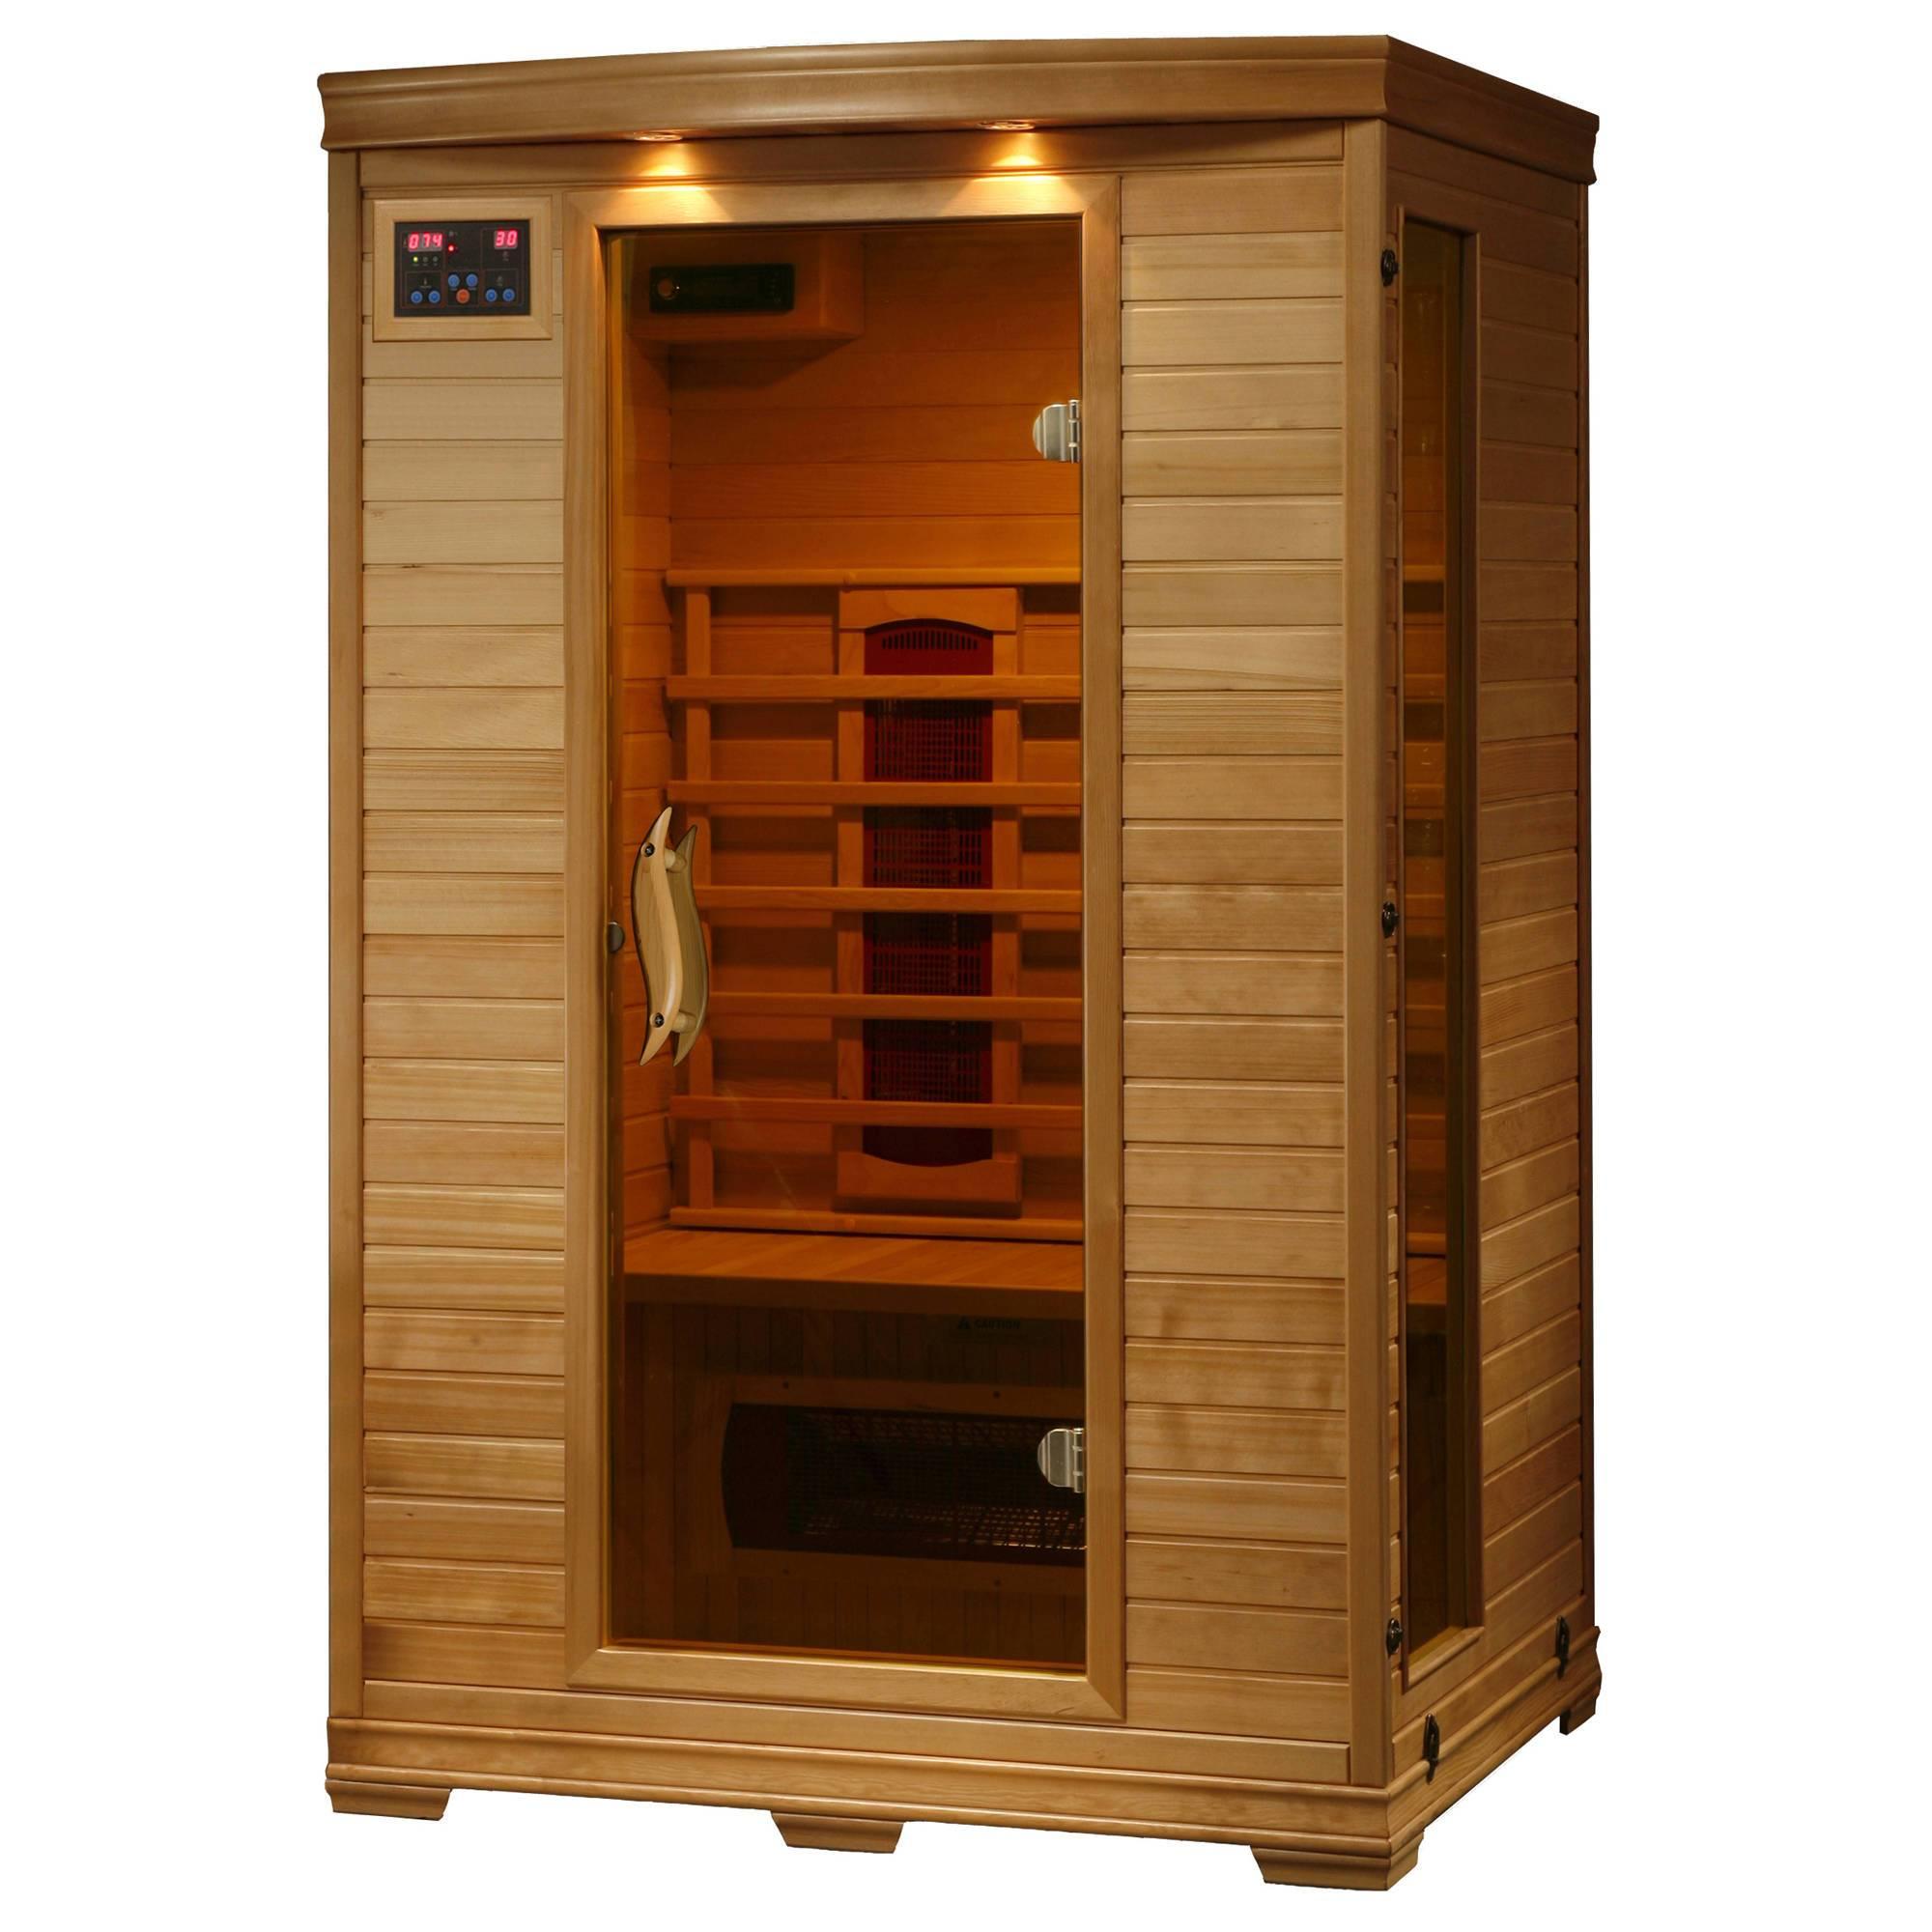 coronado-sa2406-2-person-hemlock-deluxe-infrared-sauna